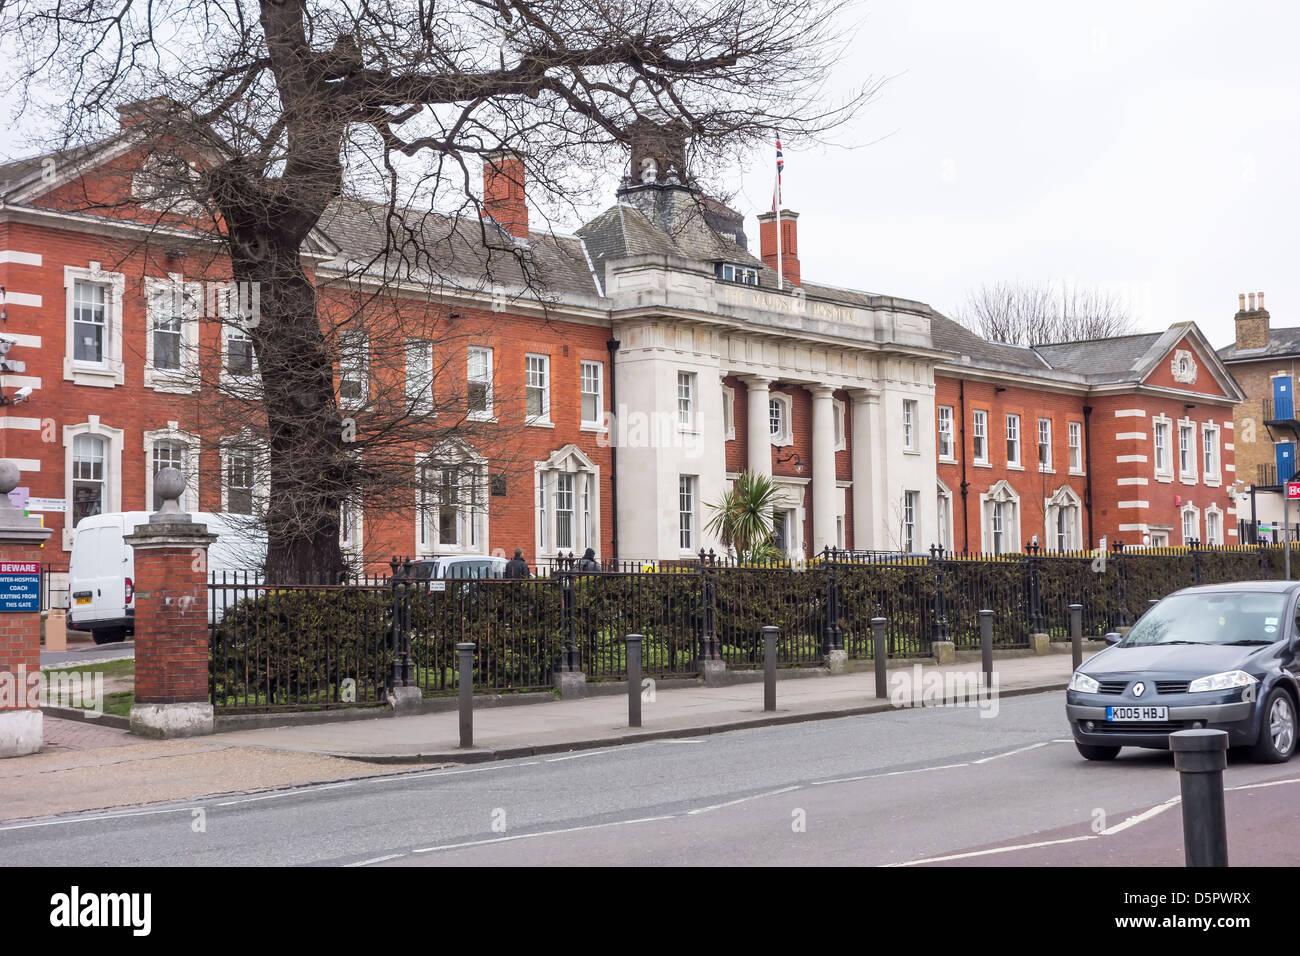 Maudsley NHS Mental Health Hospital London UK - Stock Image